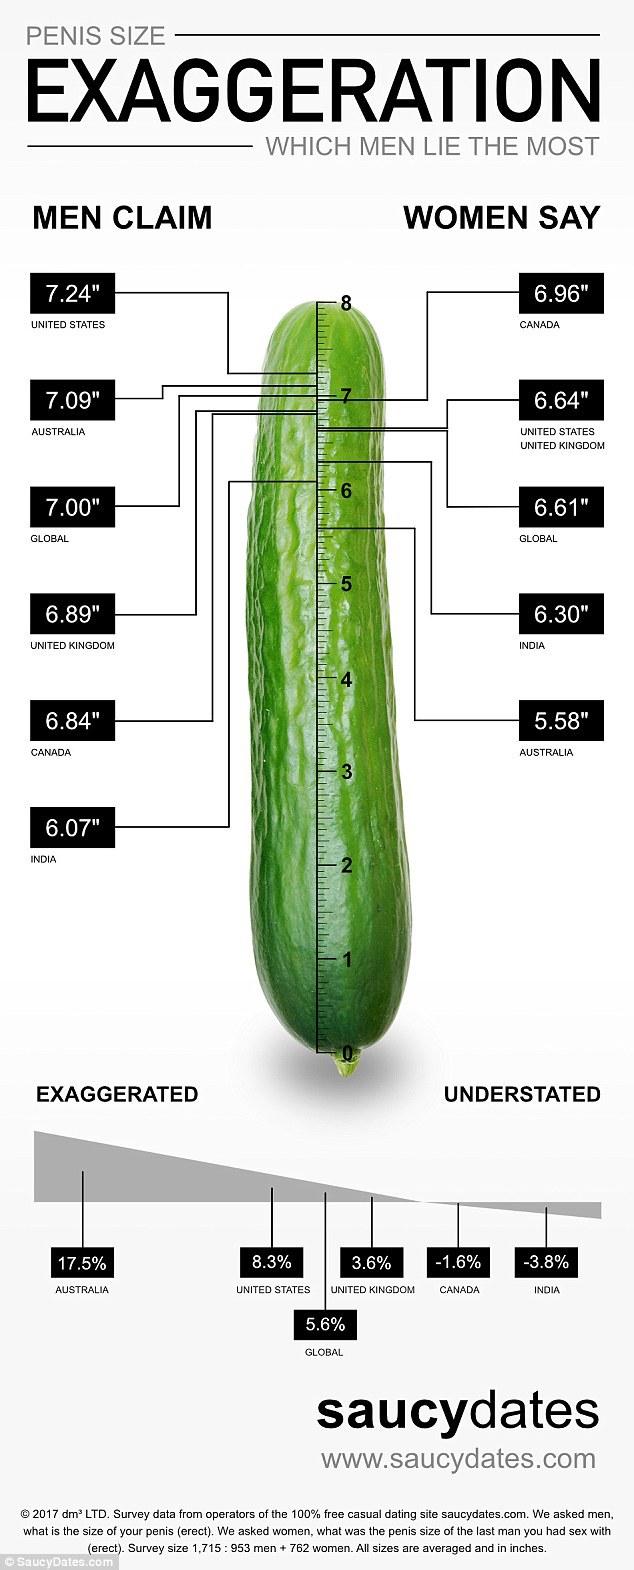 ce dimensiune are penisul masculin)